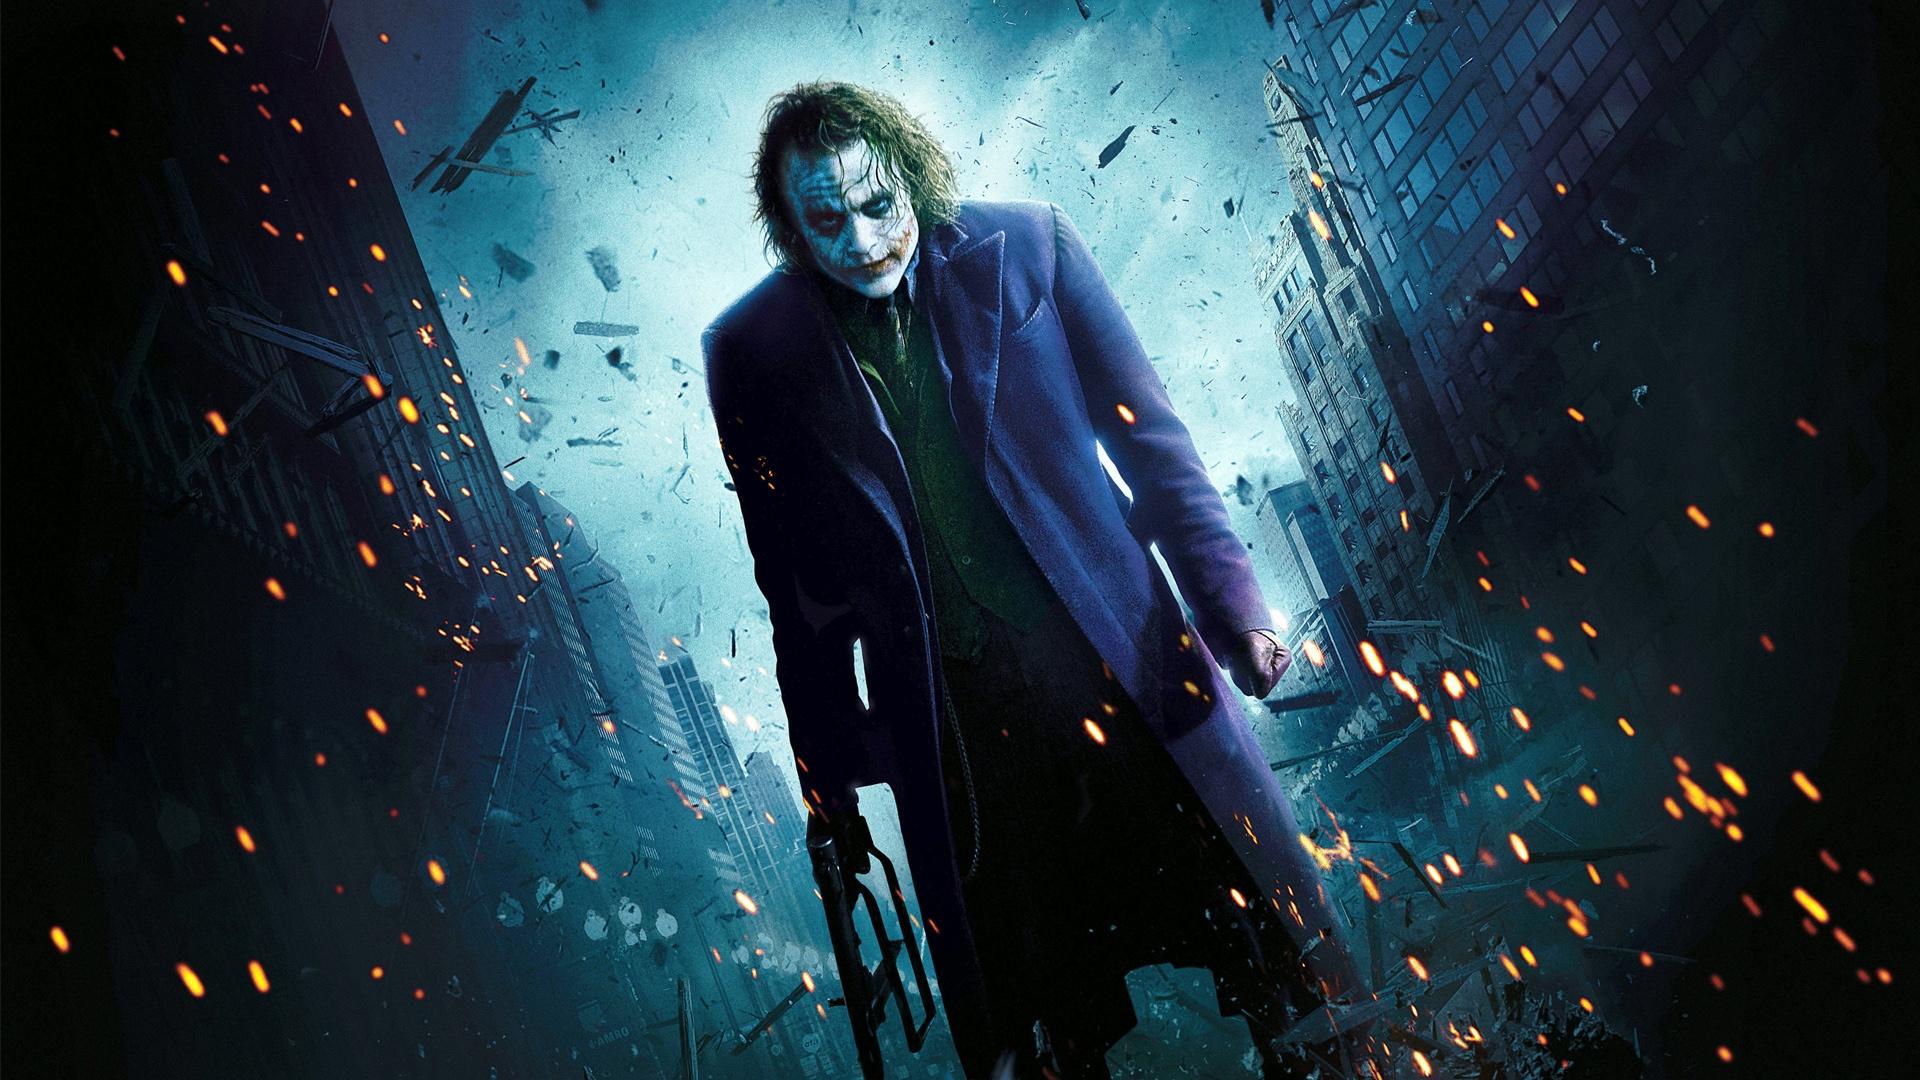 Wallpaper download joker - The Joker Full Hd Wallpaper 1920x1080